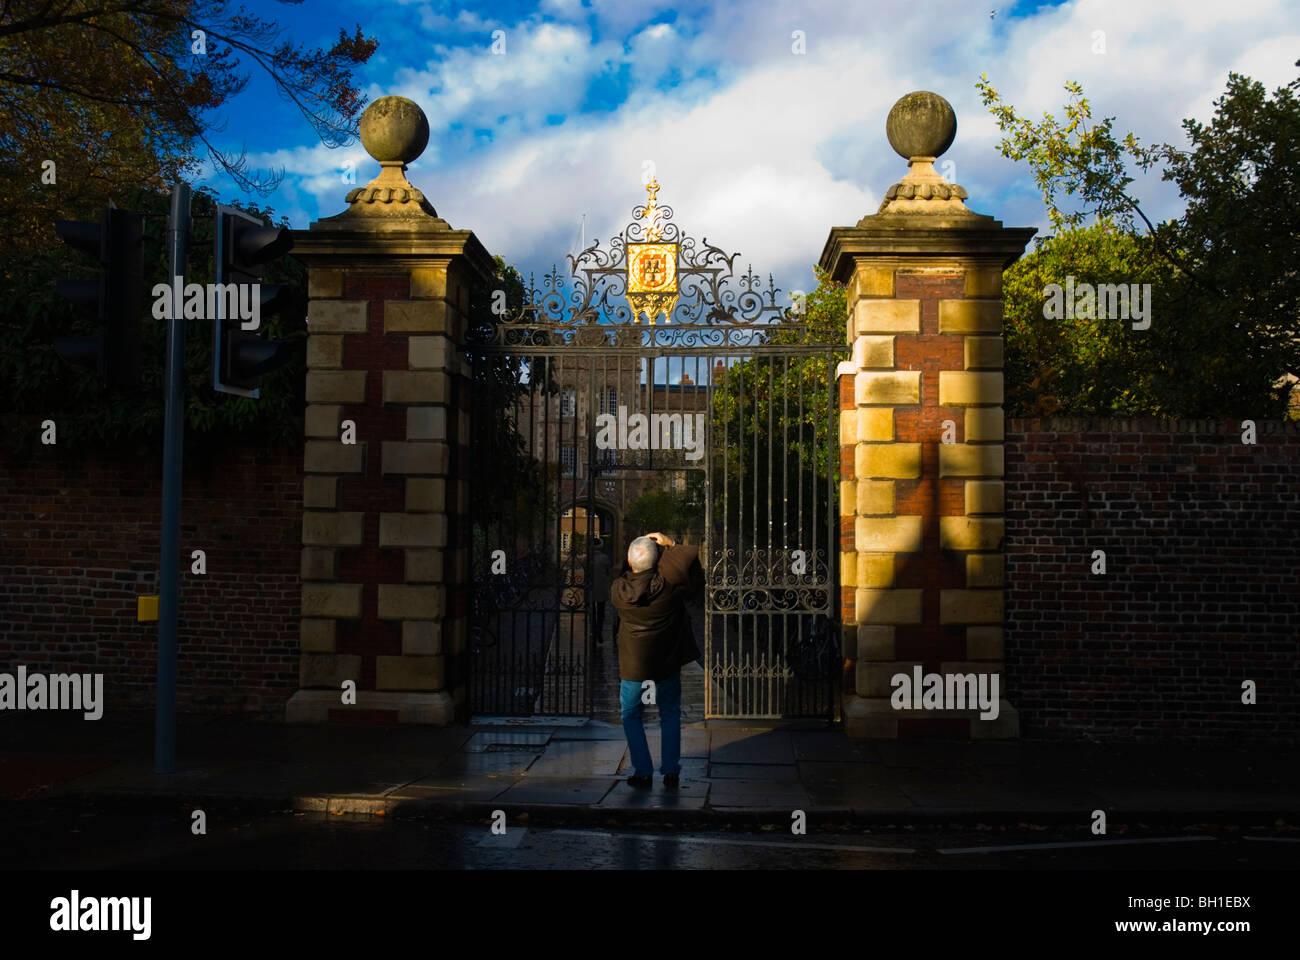 Gate of Jesus College Jesus Lane central Cambridge England UK Europe - Stock Image